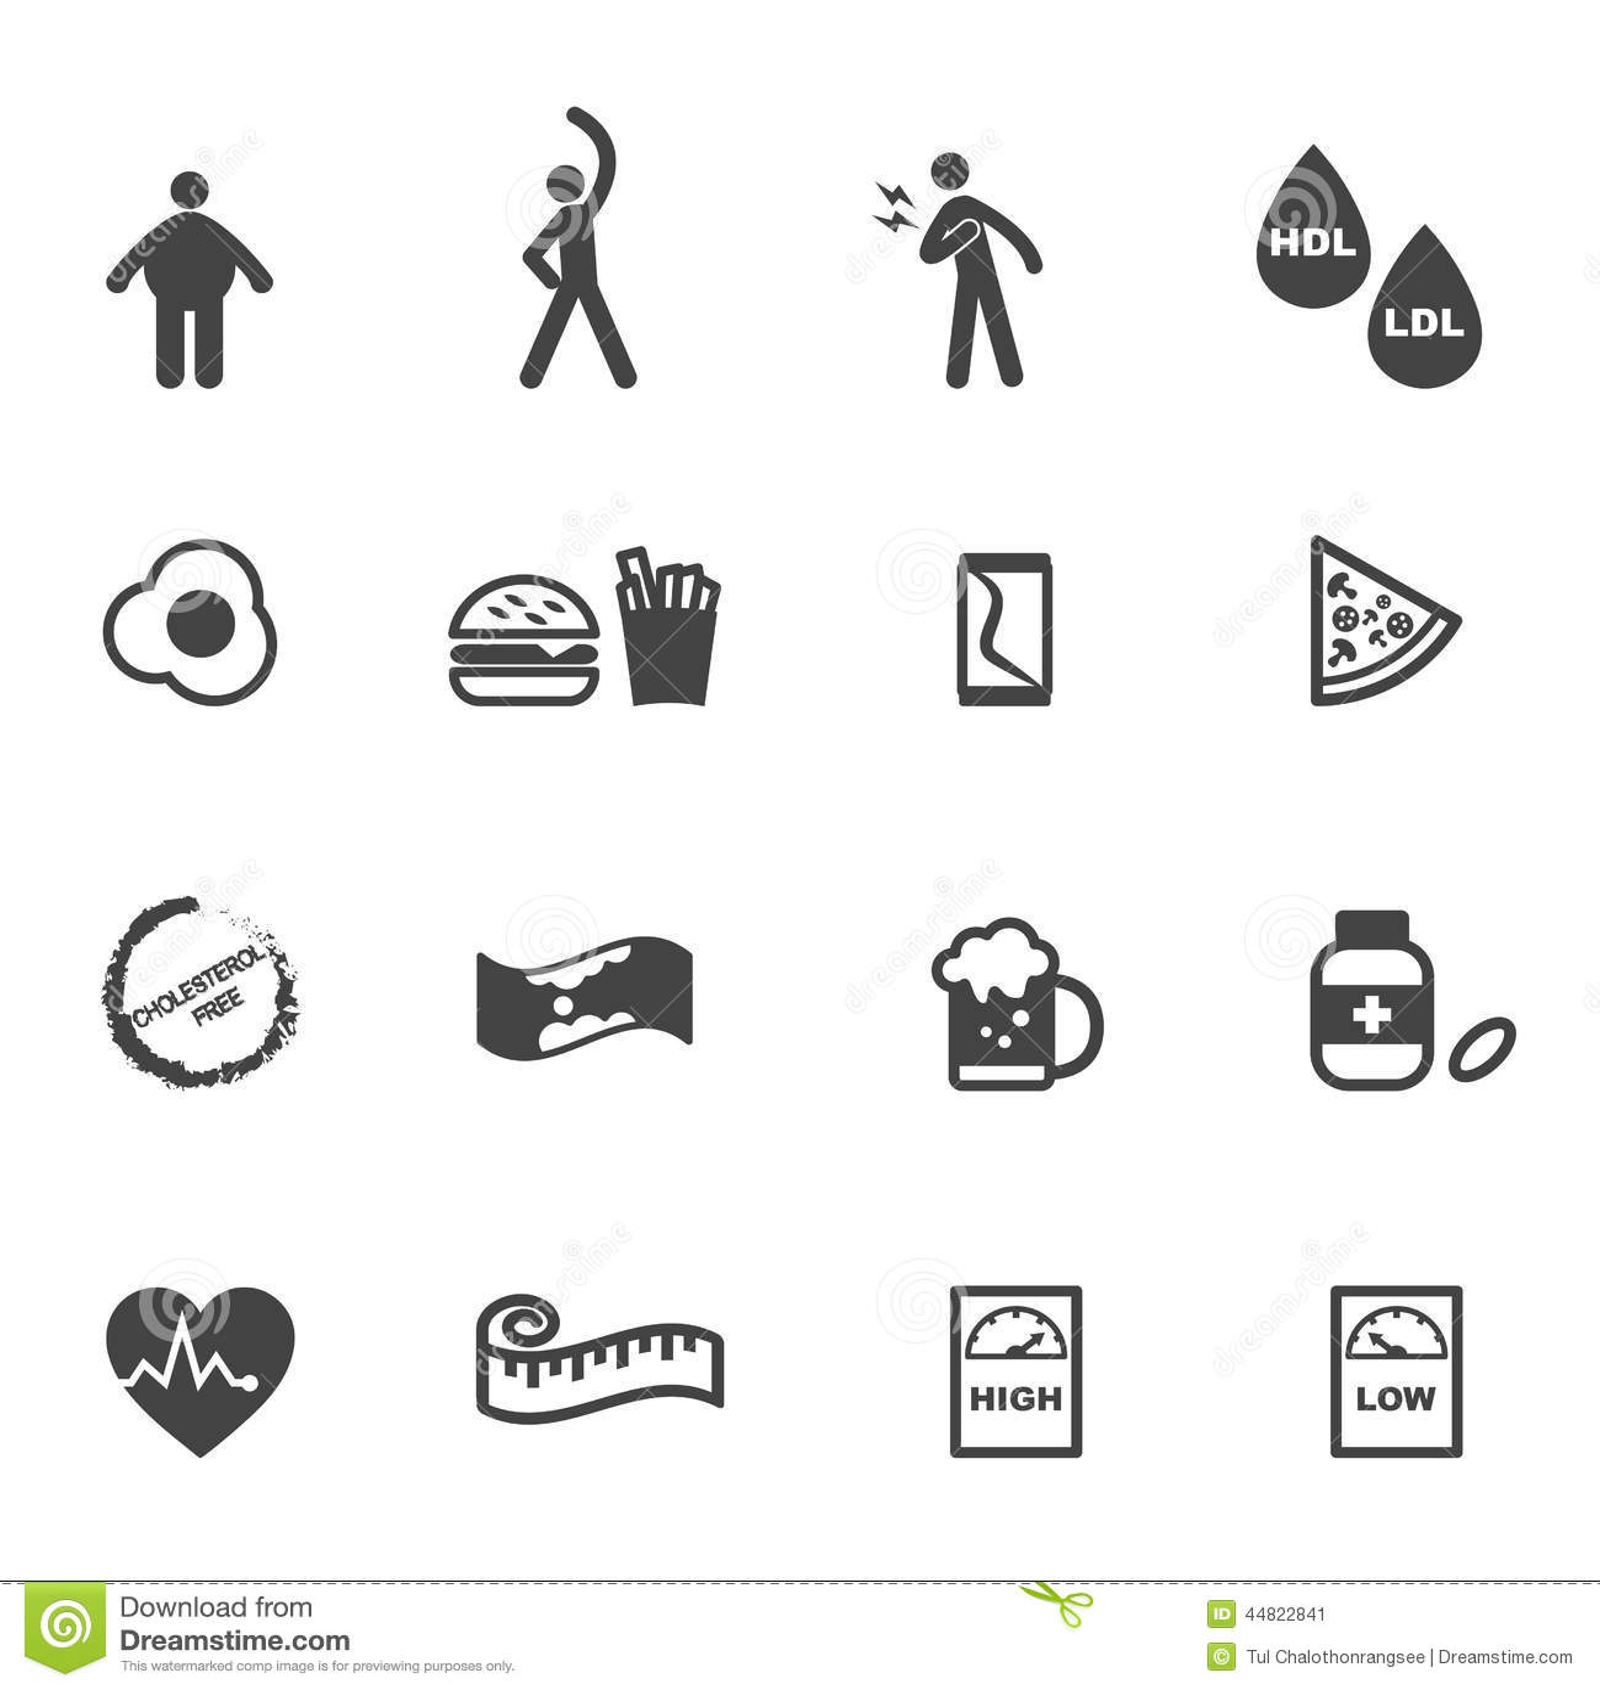 Cholesterol icons